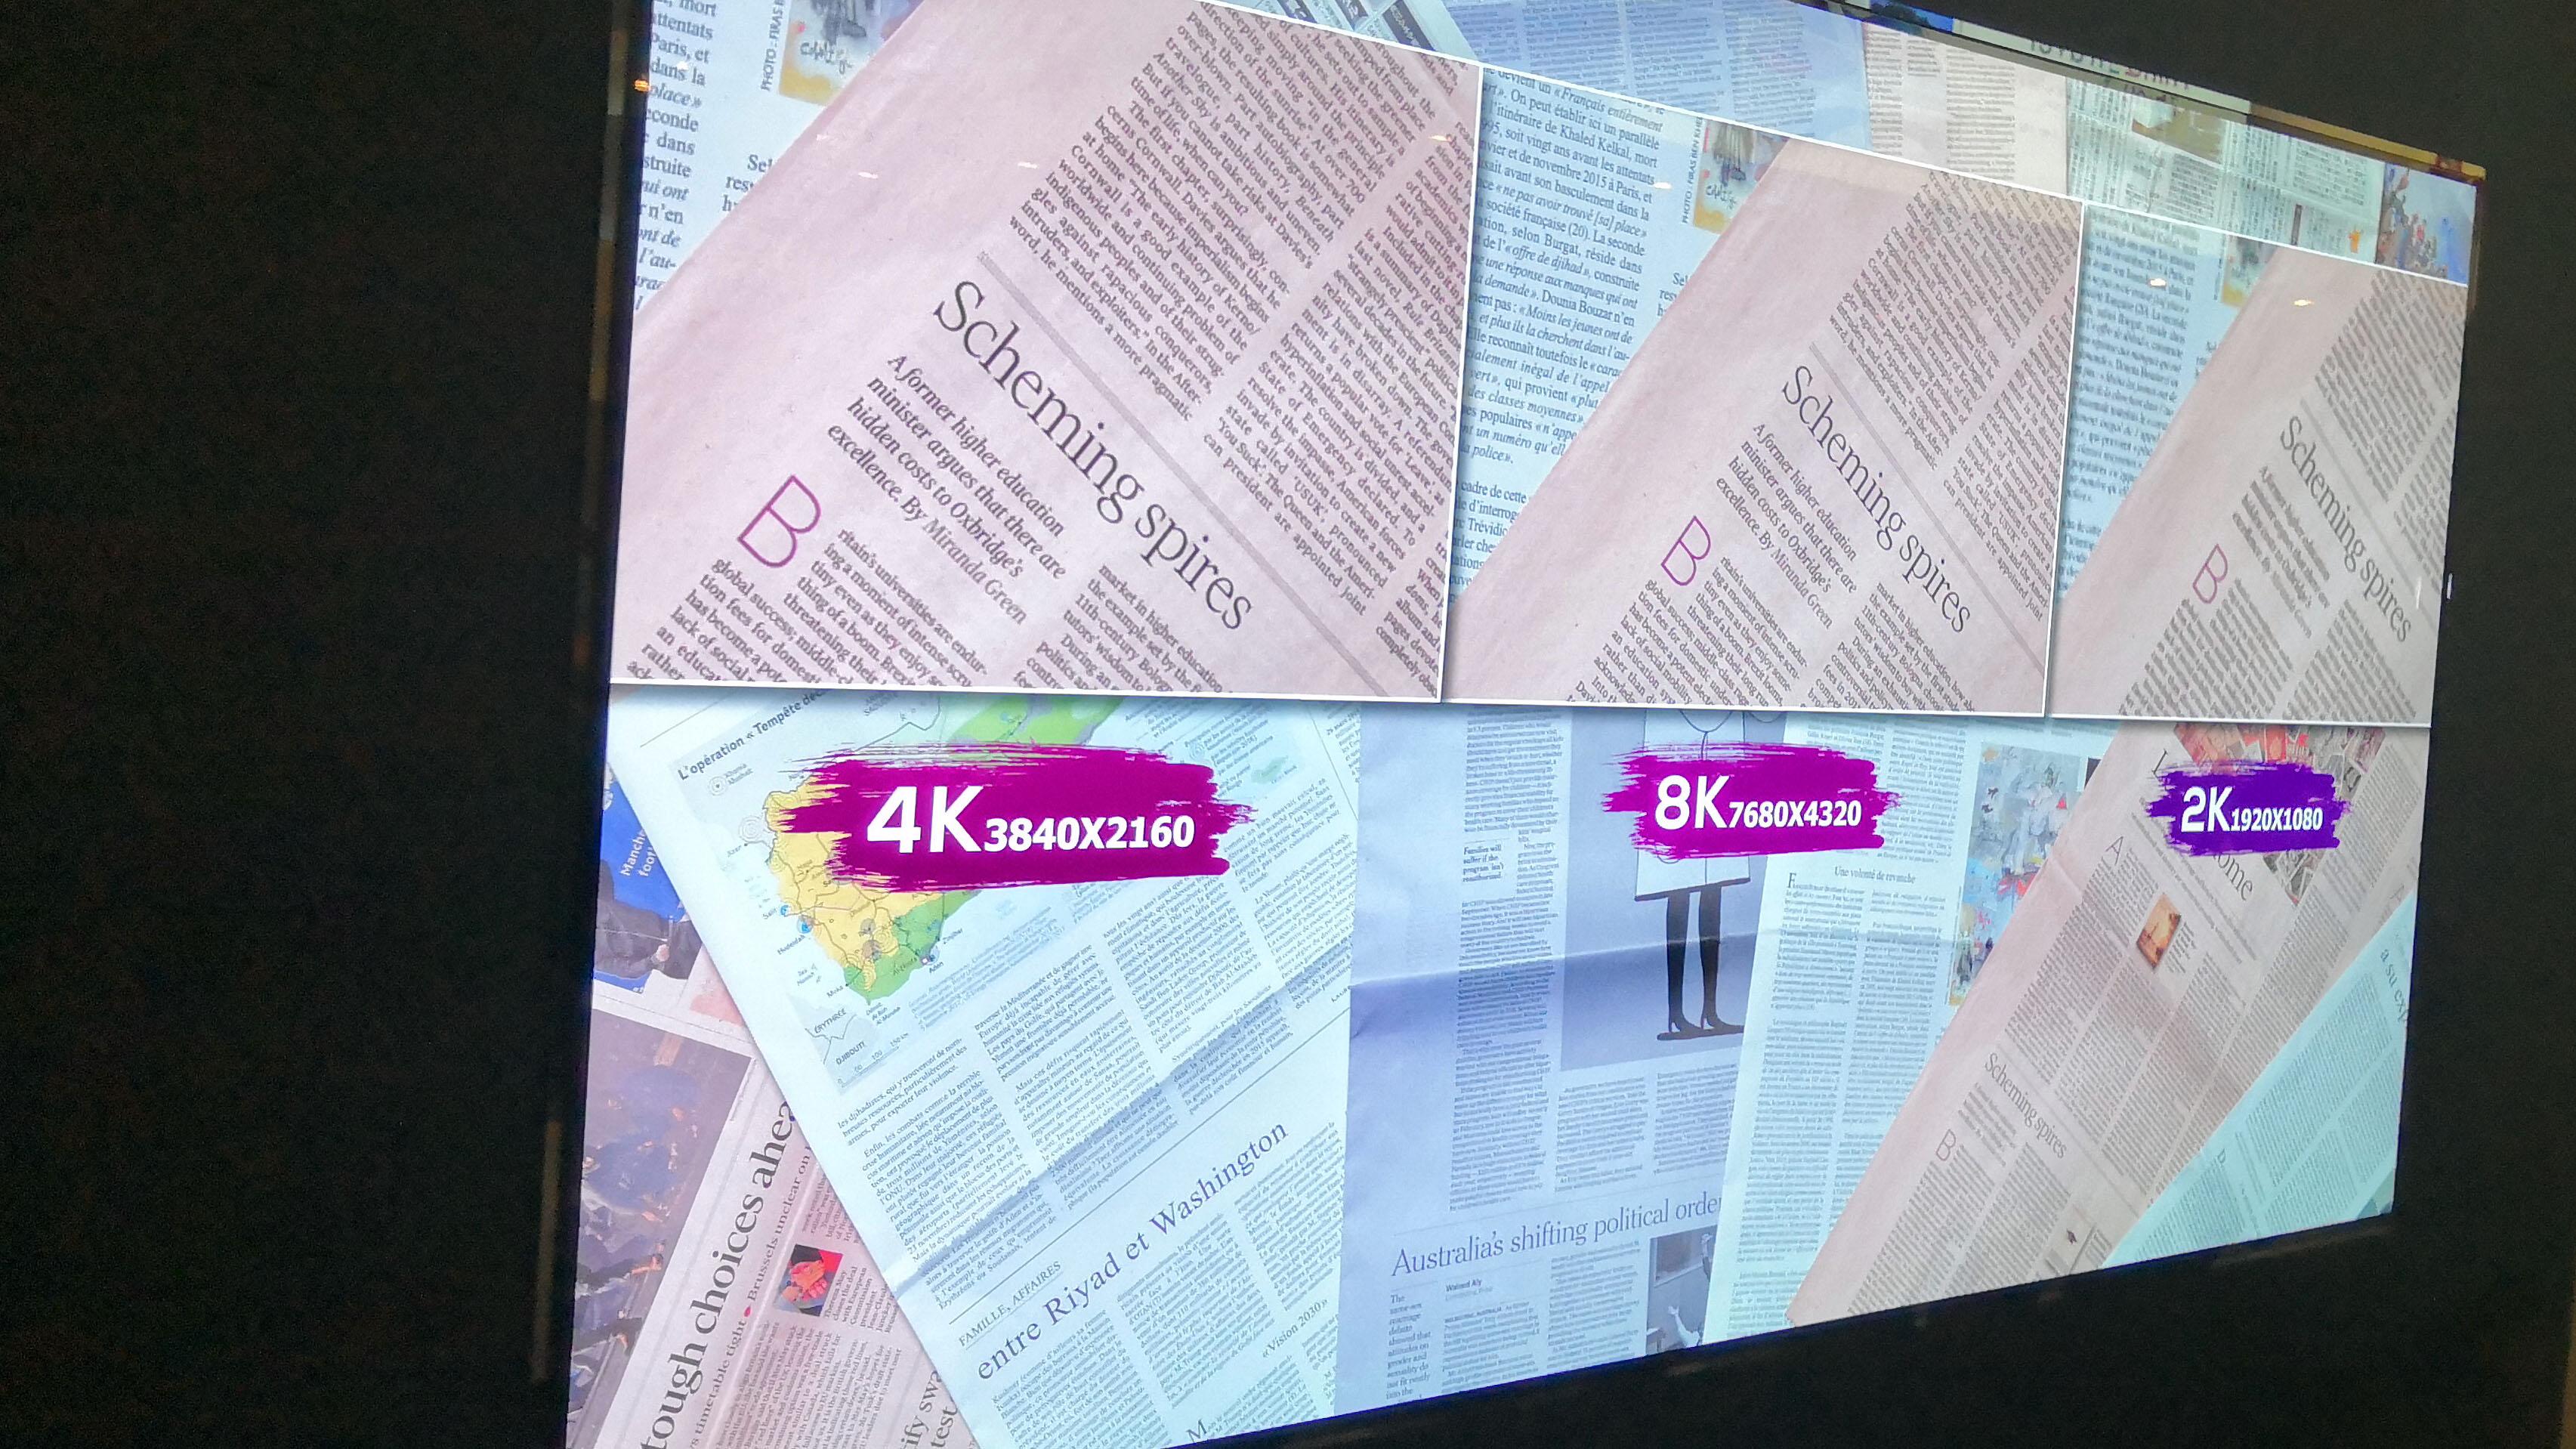 First look: LG 8K OLED TV - iBlogiBlog